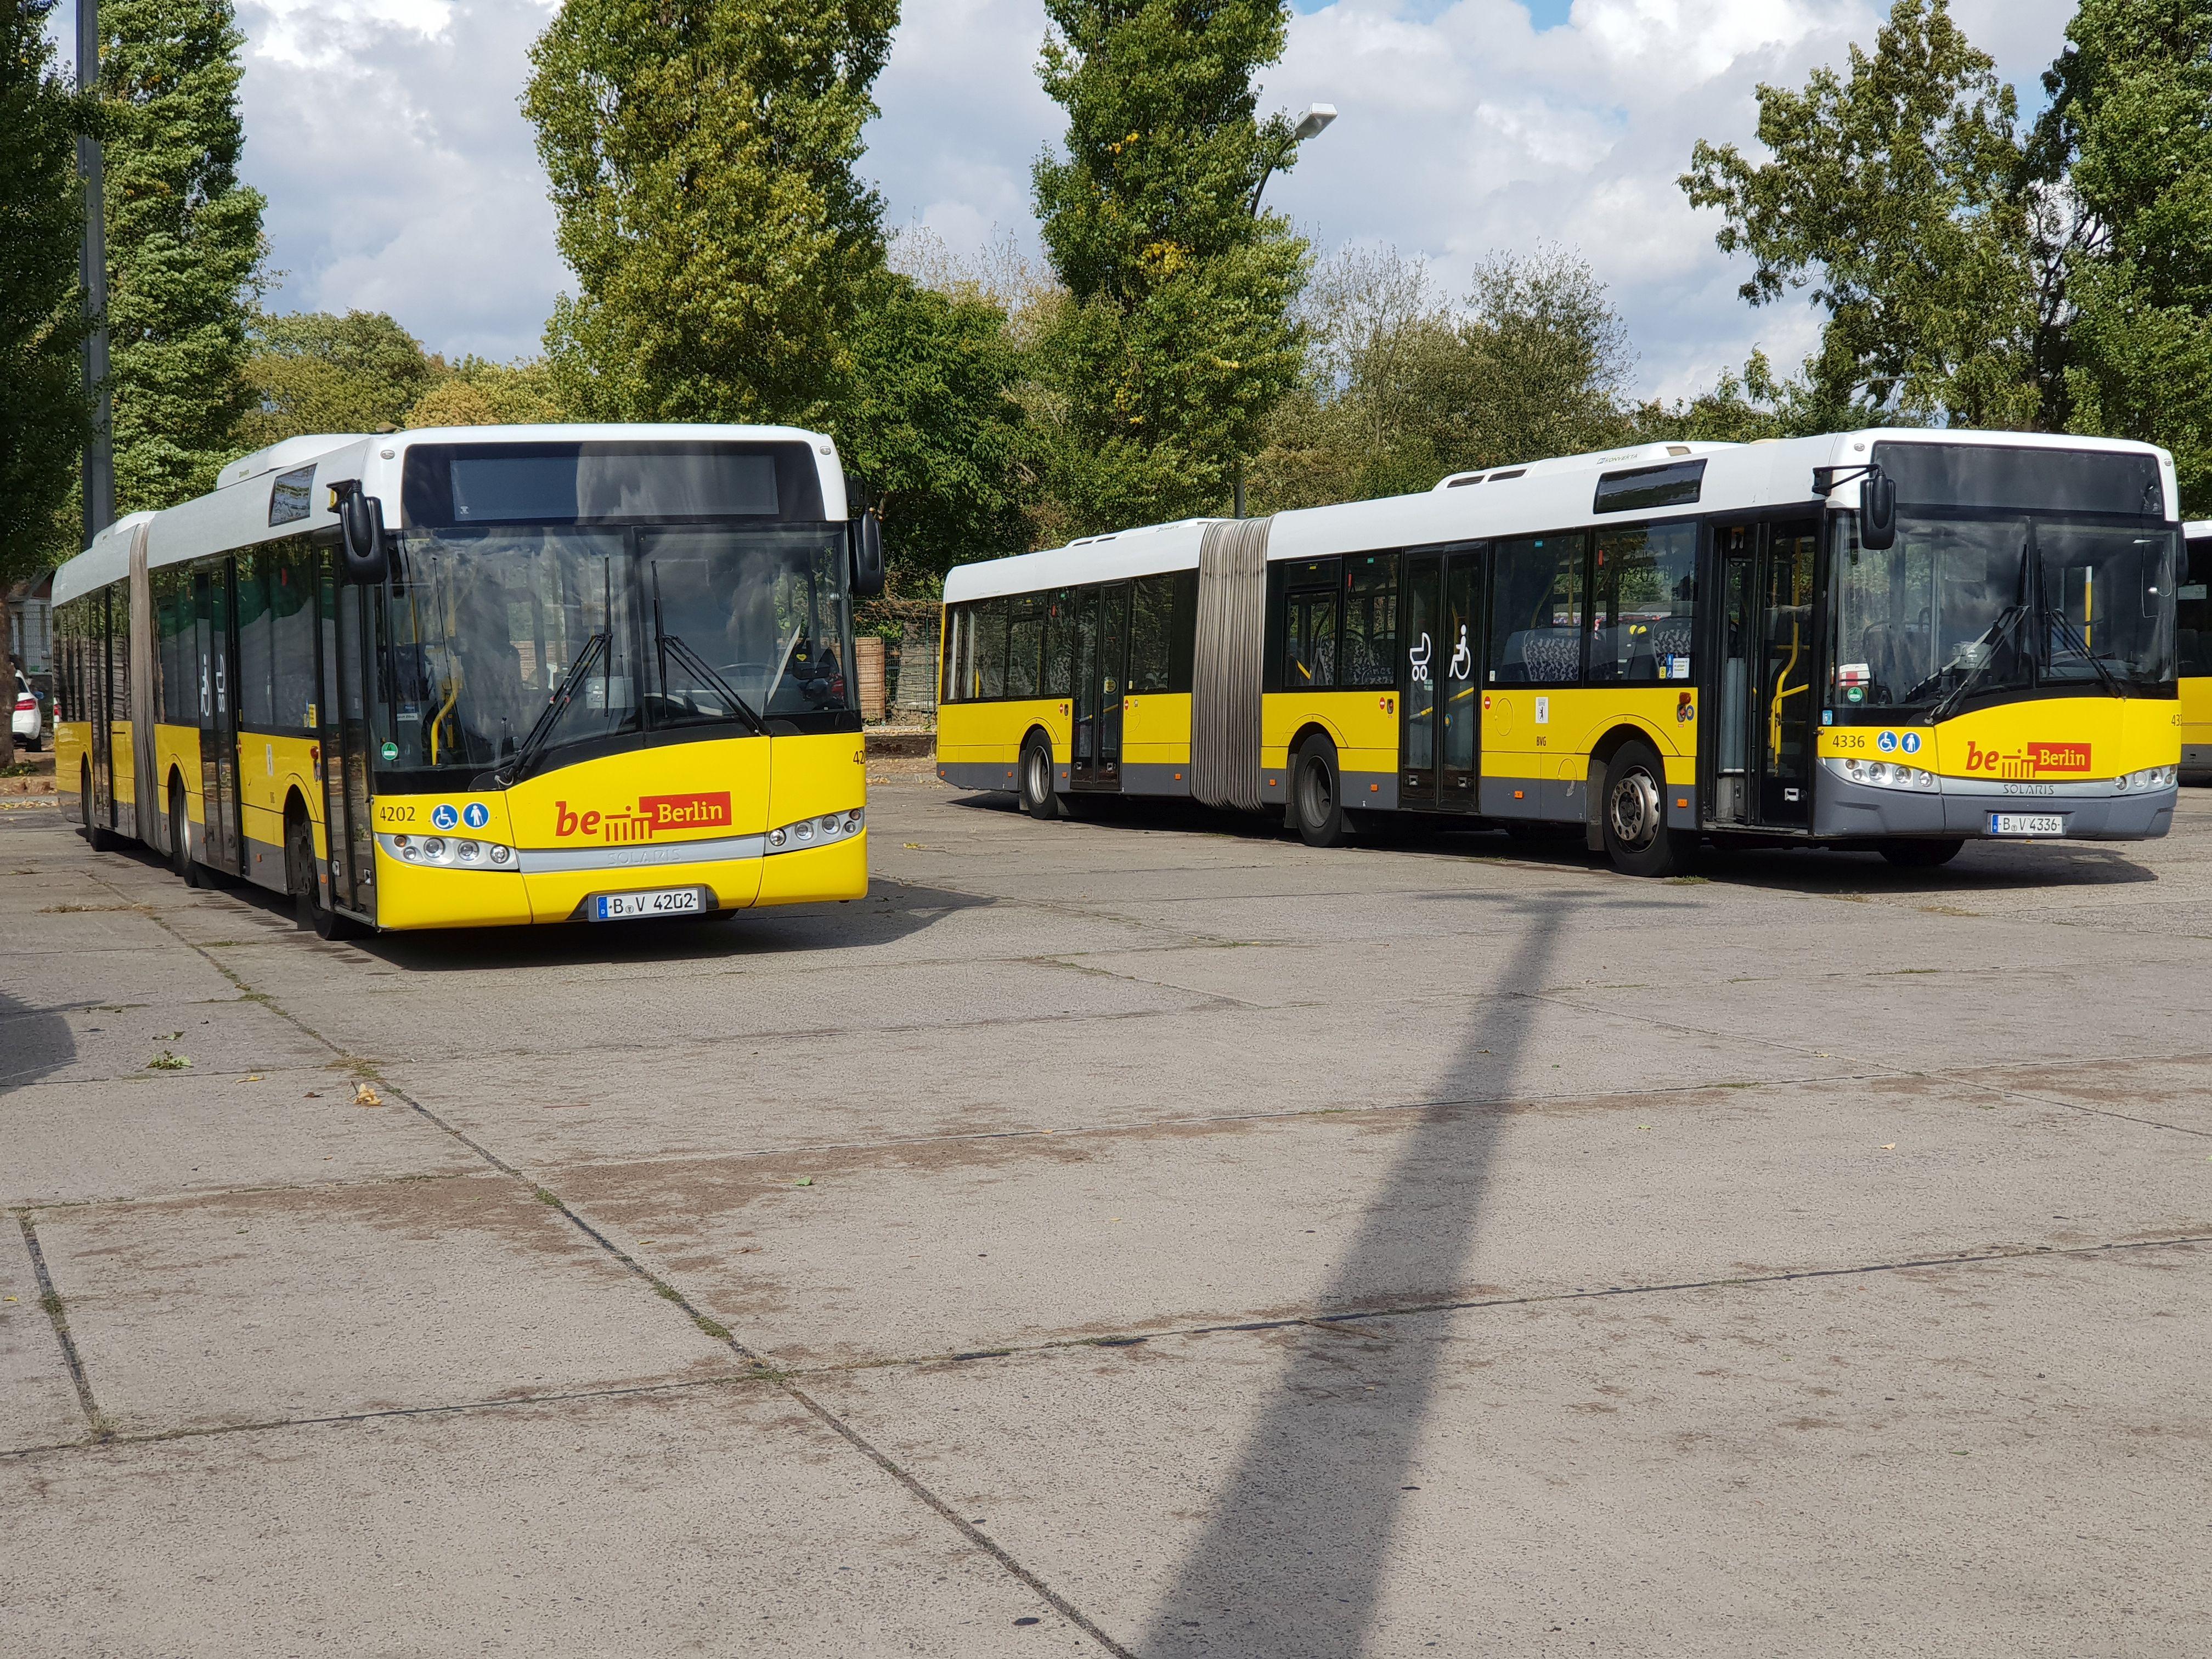 Foto: Bus 43362, Typ Solaris Urbino 18, Hof Siegfriedstr., September 2018